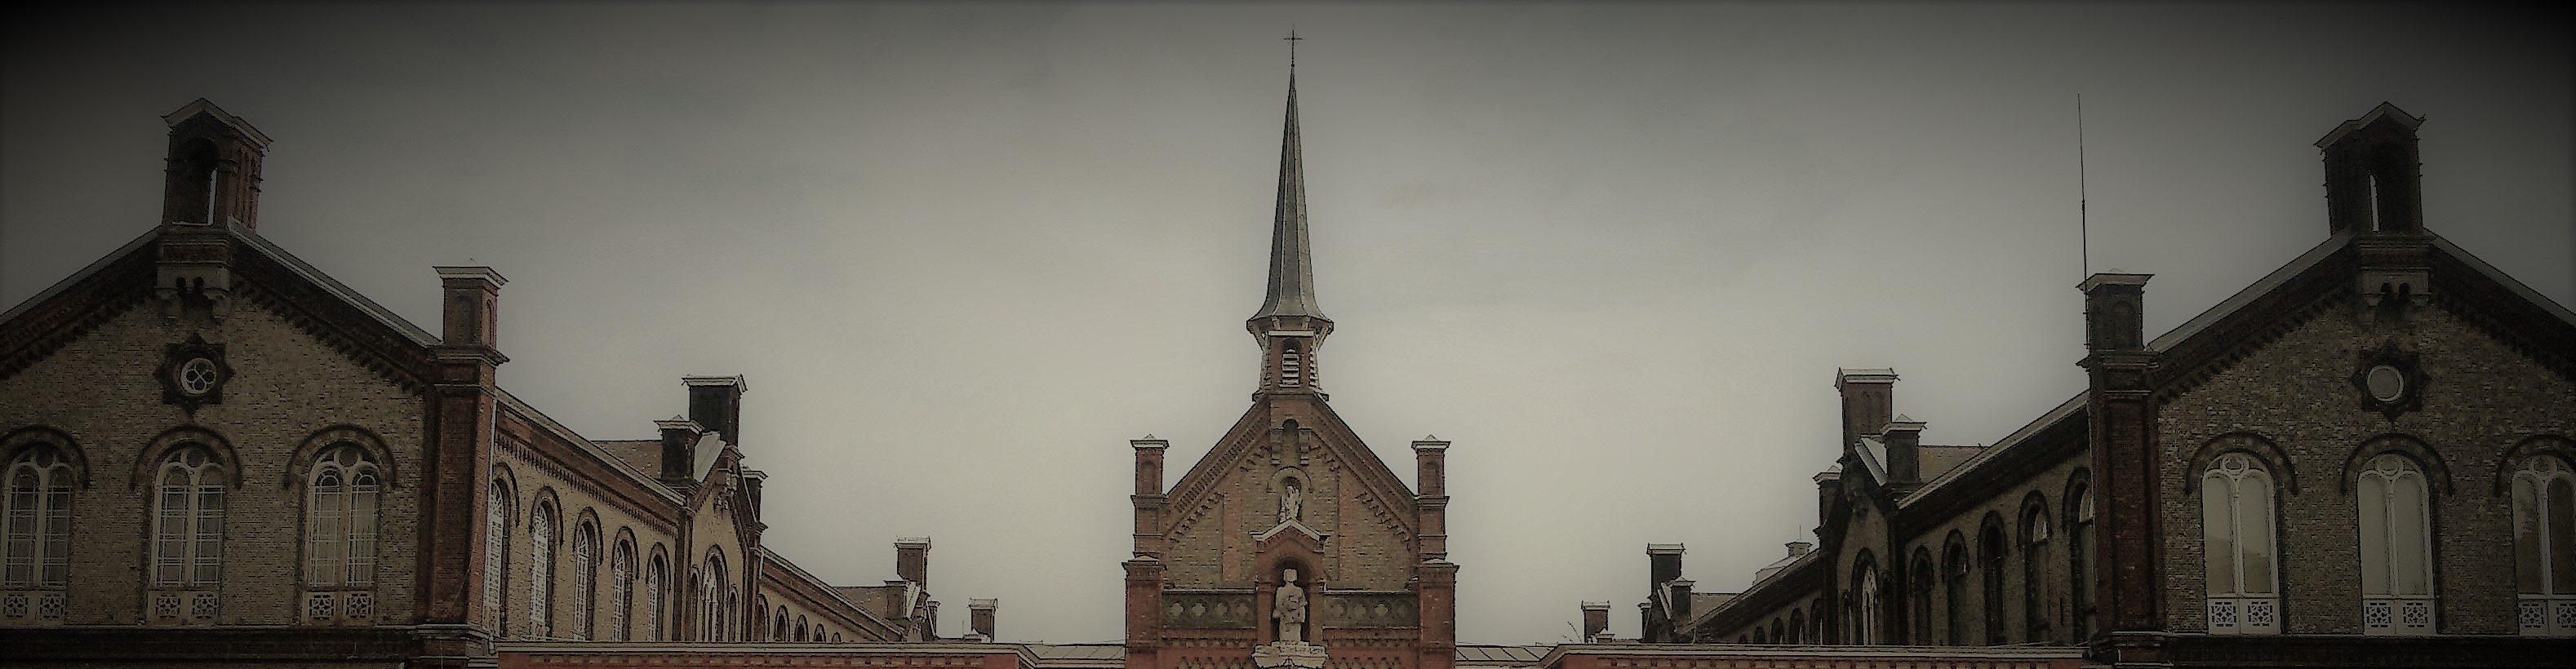 voormalig gesticht, thans museum Dr. Guislain te Gent